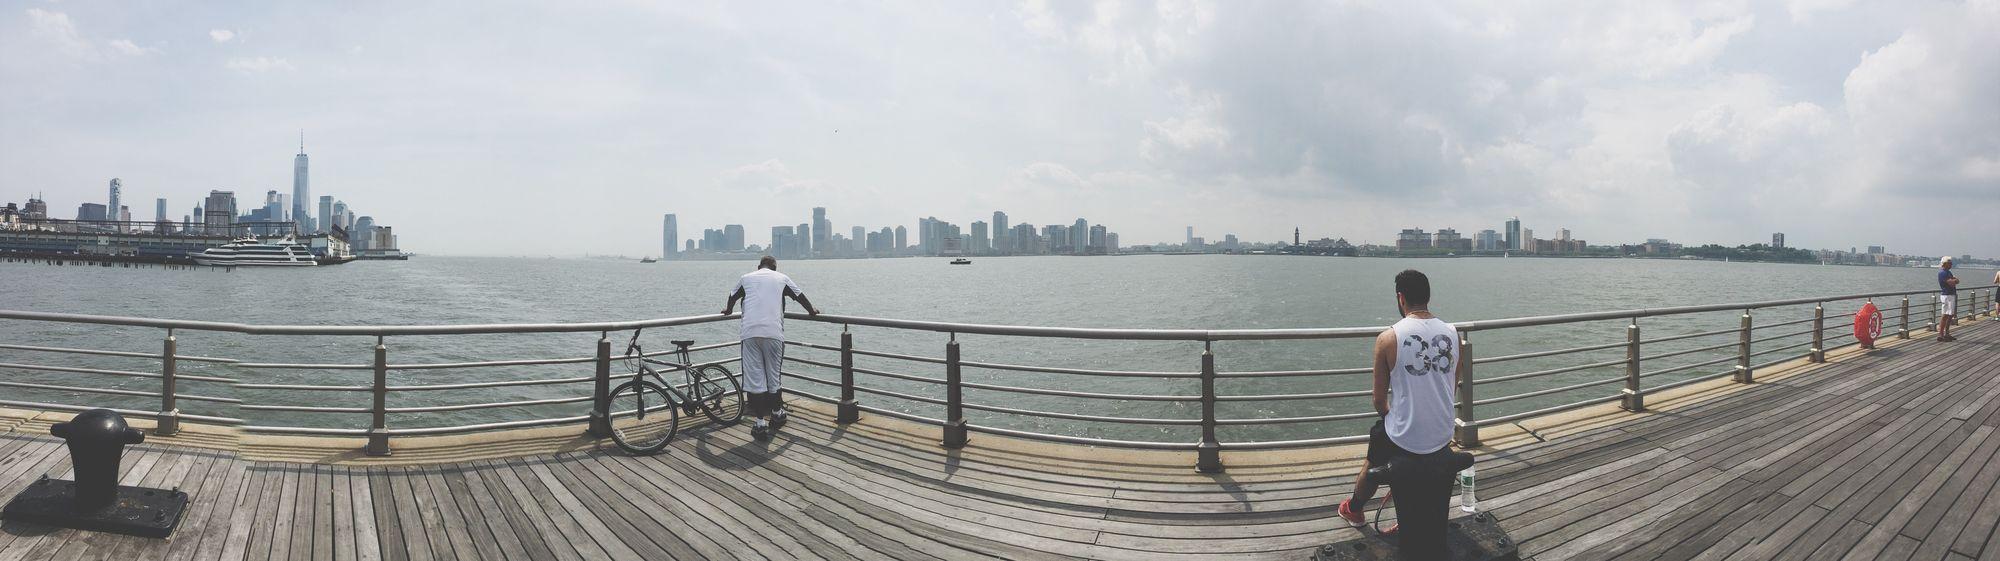 Sightseeing Skyline